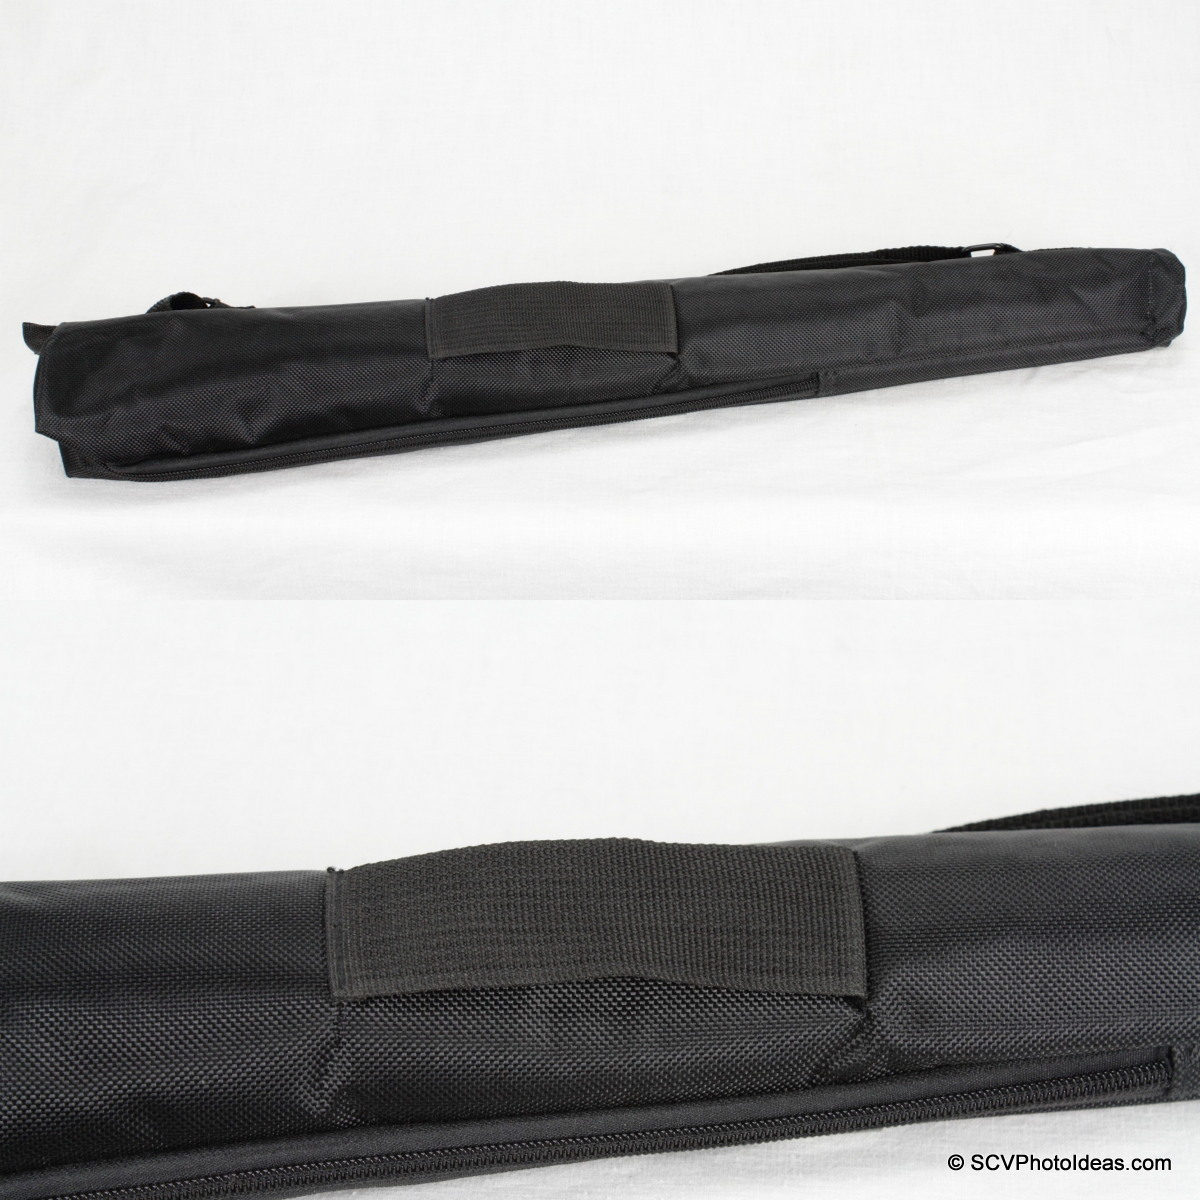 Triopo GL-70 CF Monopod - carrying case handle